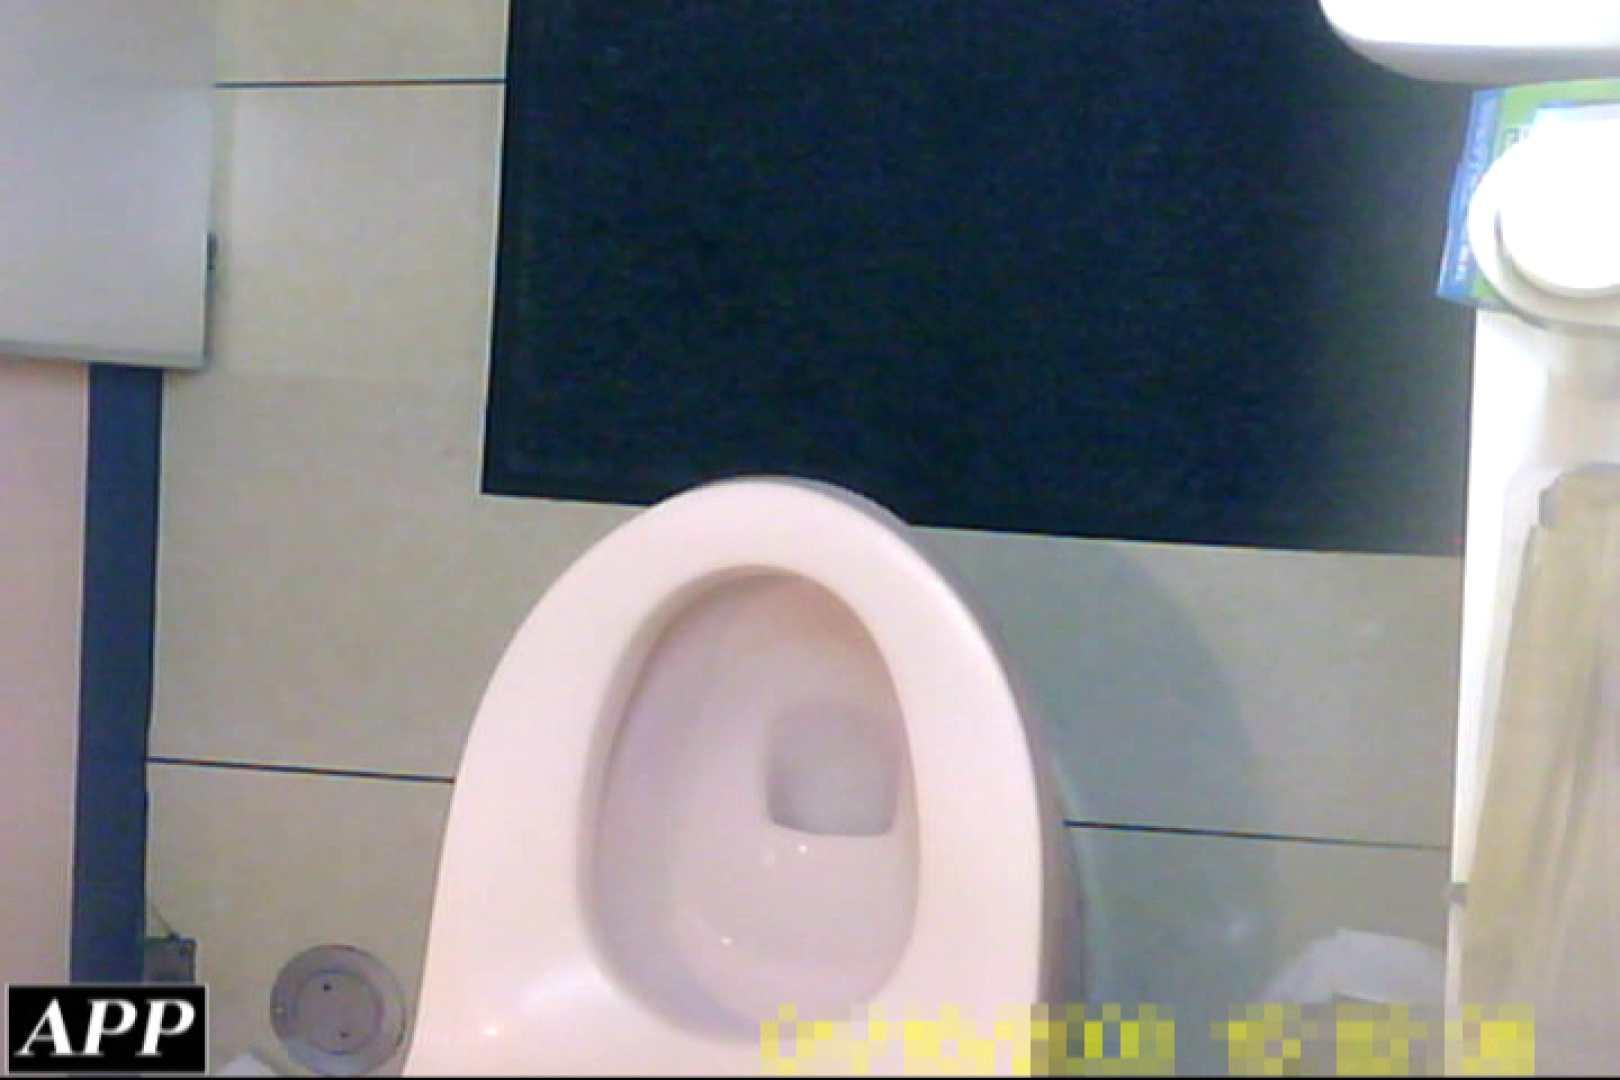 3視点洗面所 vol.144 盗撮 | OLエロ画像  62PICs 43